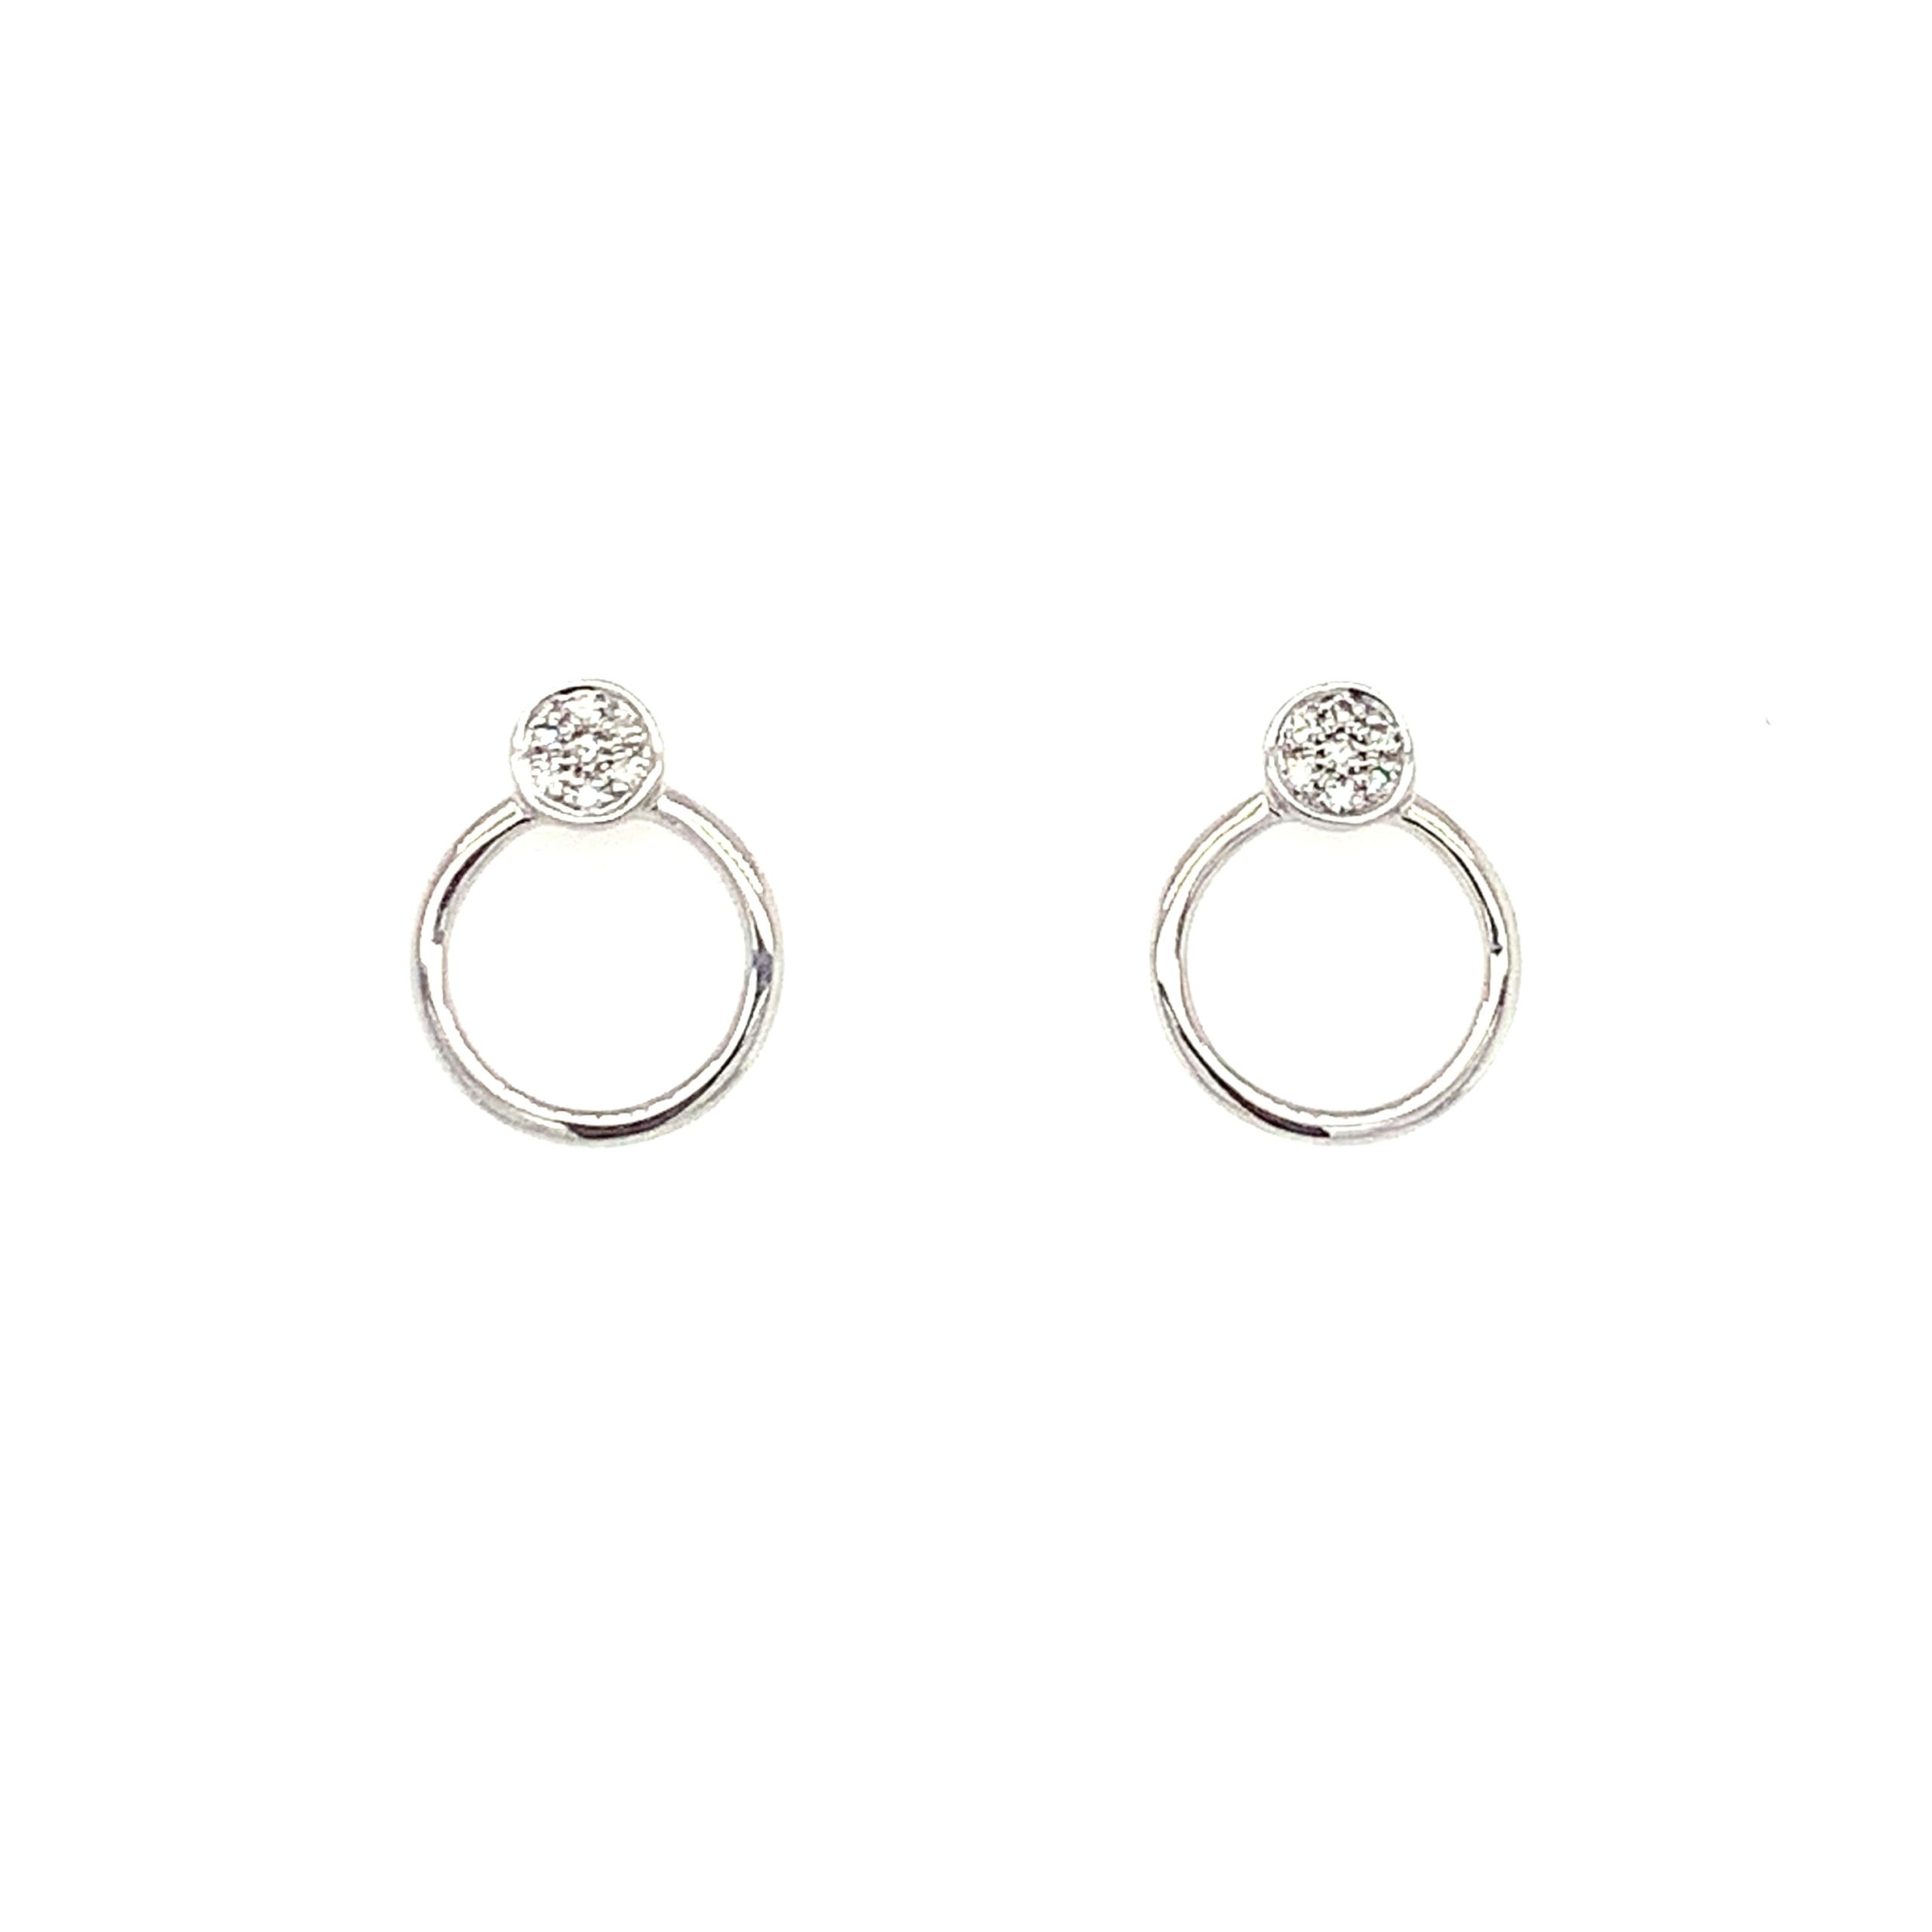 White Gold Open-Circle Diamond Earrings